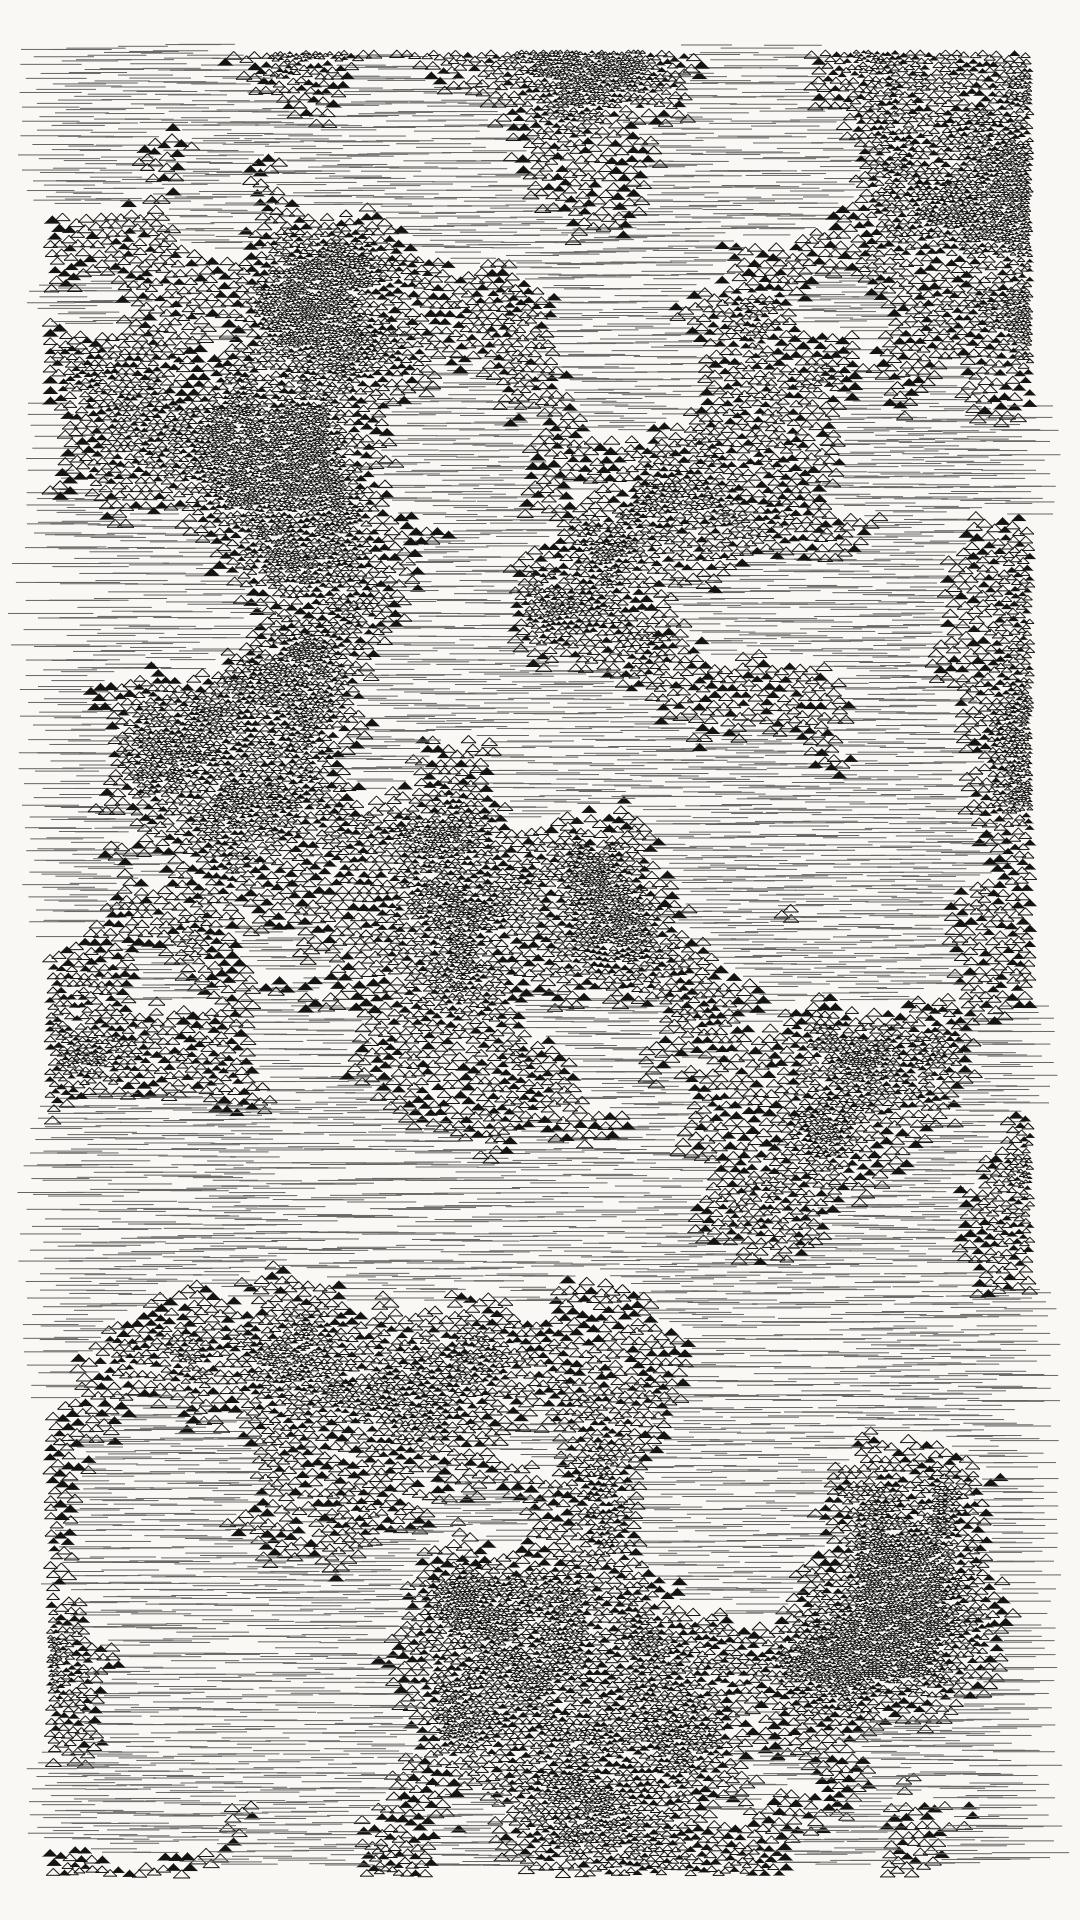 Cellular multiplication algorithm based on a Perlin Noise value